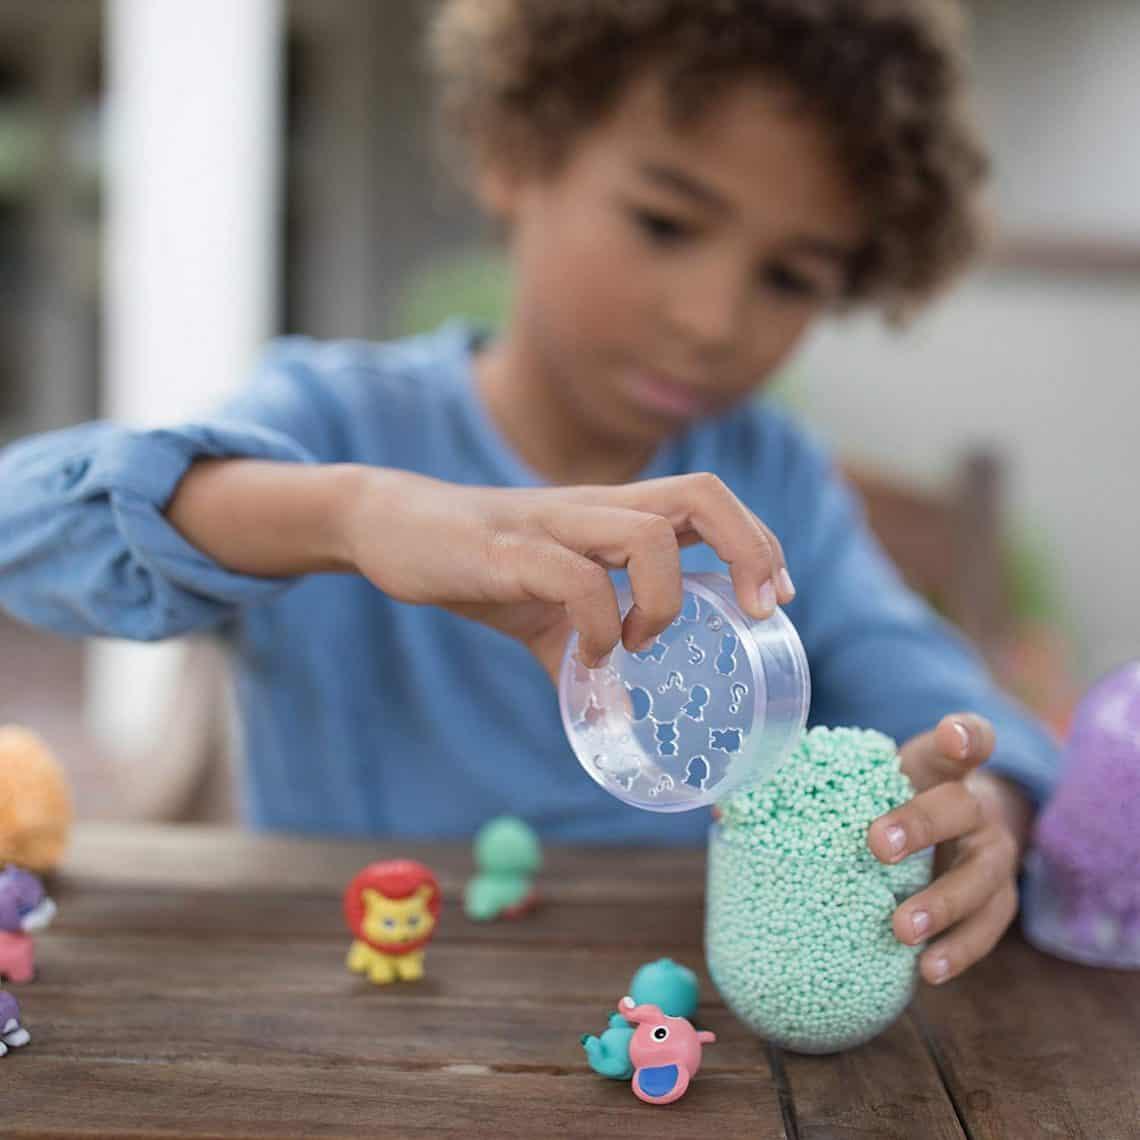 81FW2u wkL. SL1500  1140x1140 - 2018 Gift Guide: Stocking Stuffers for Kids